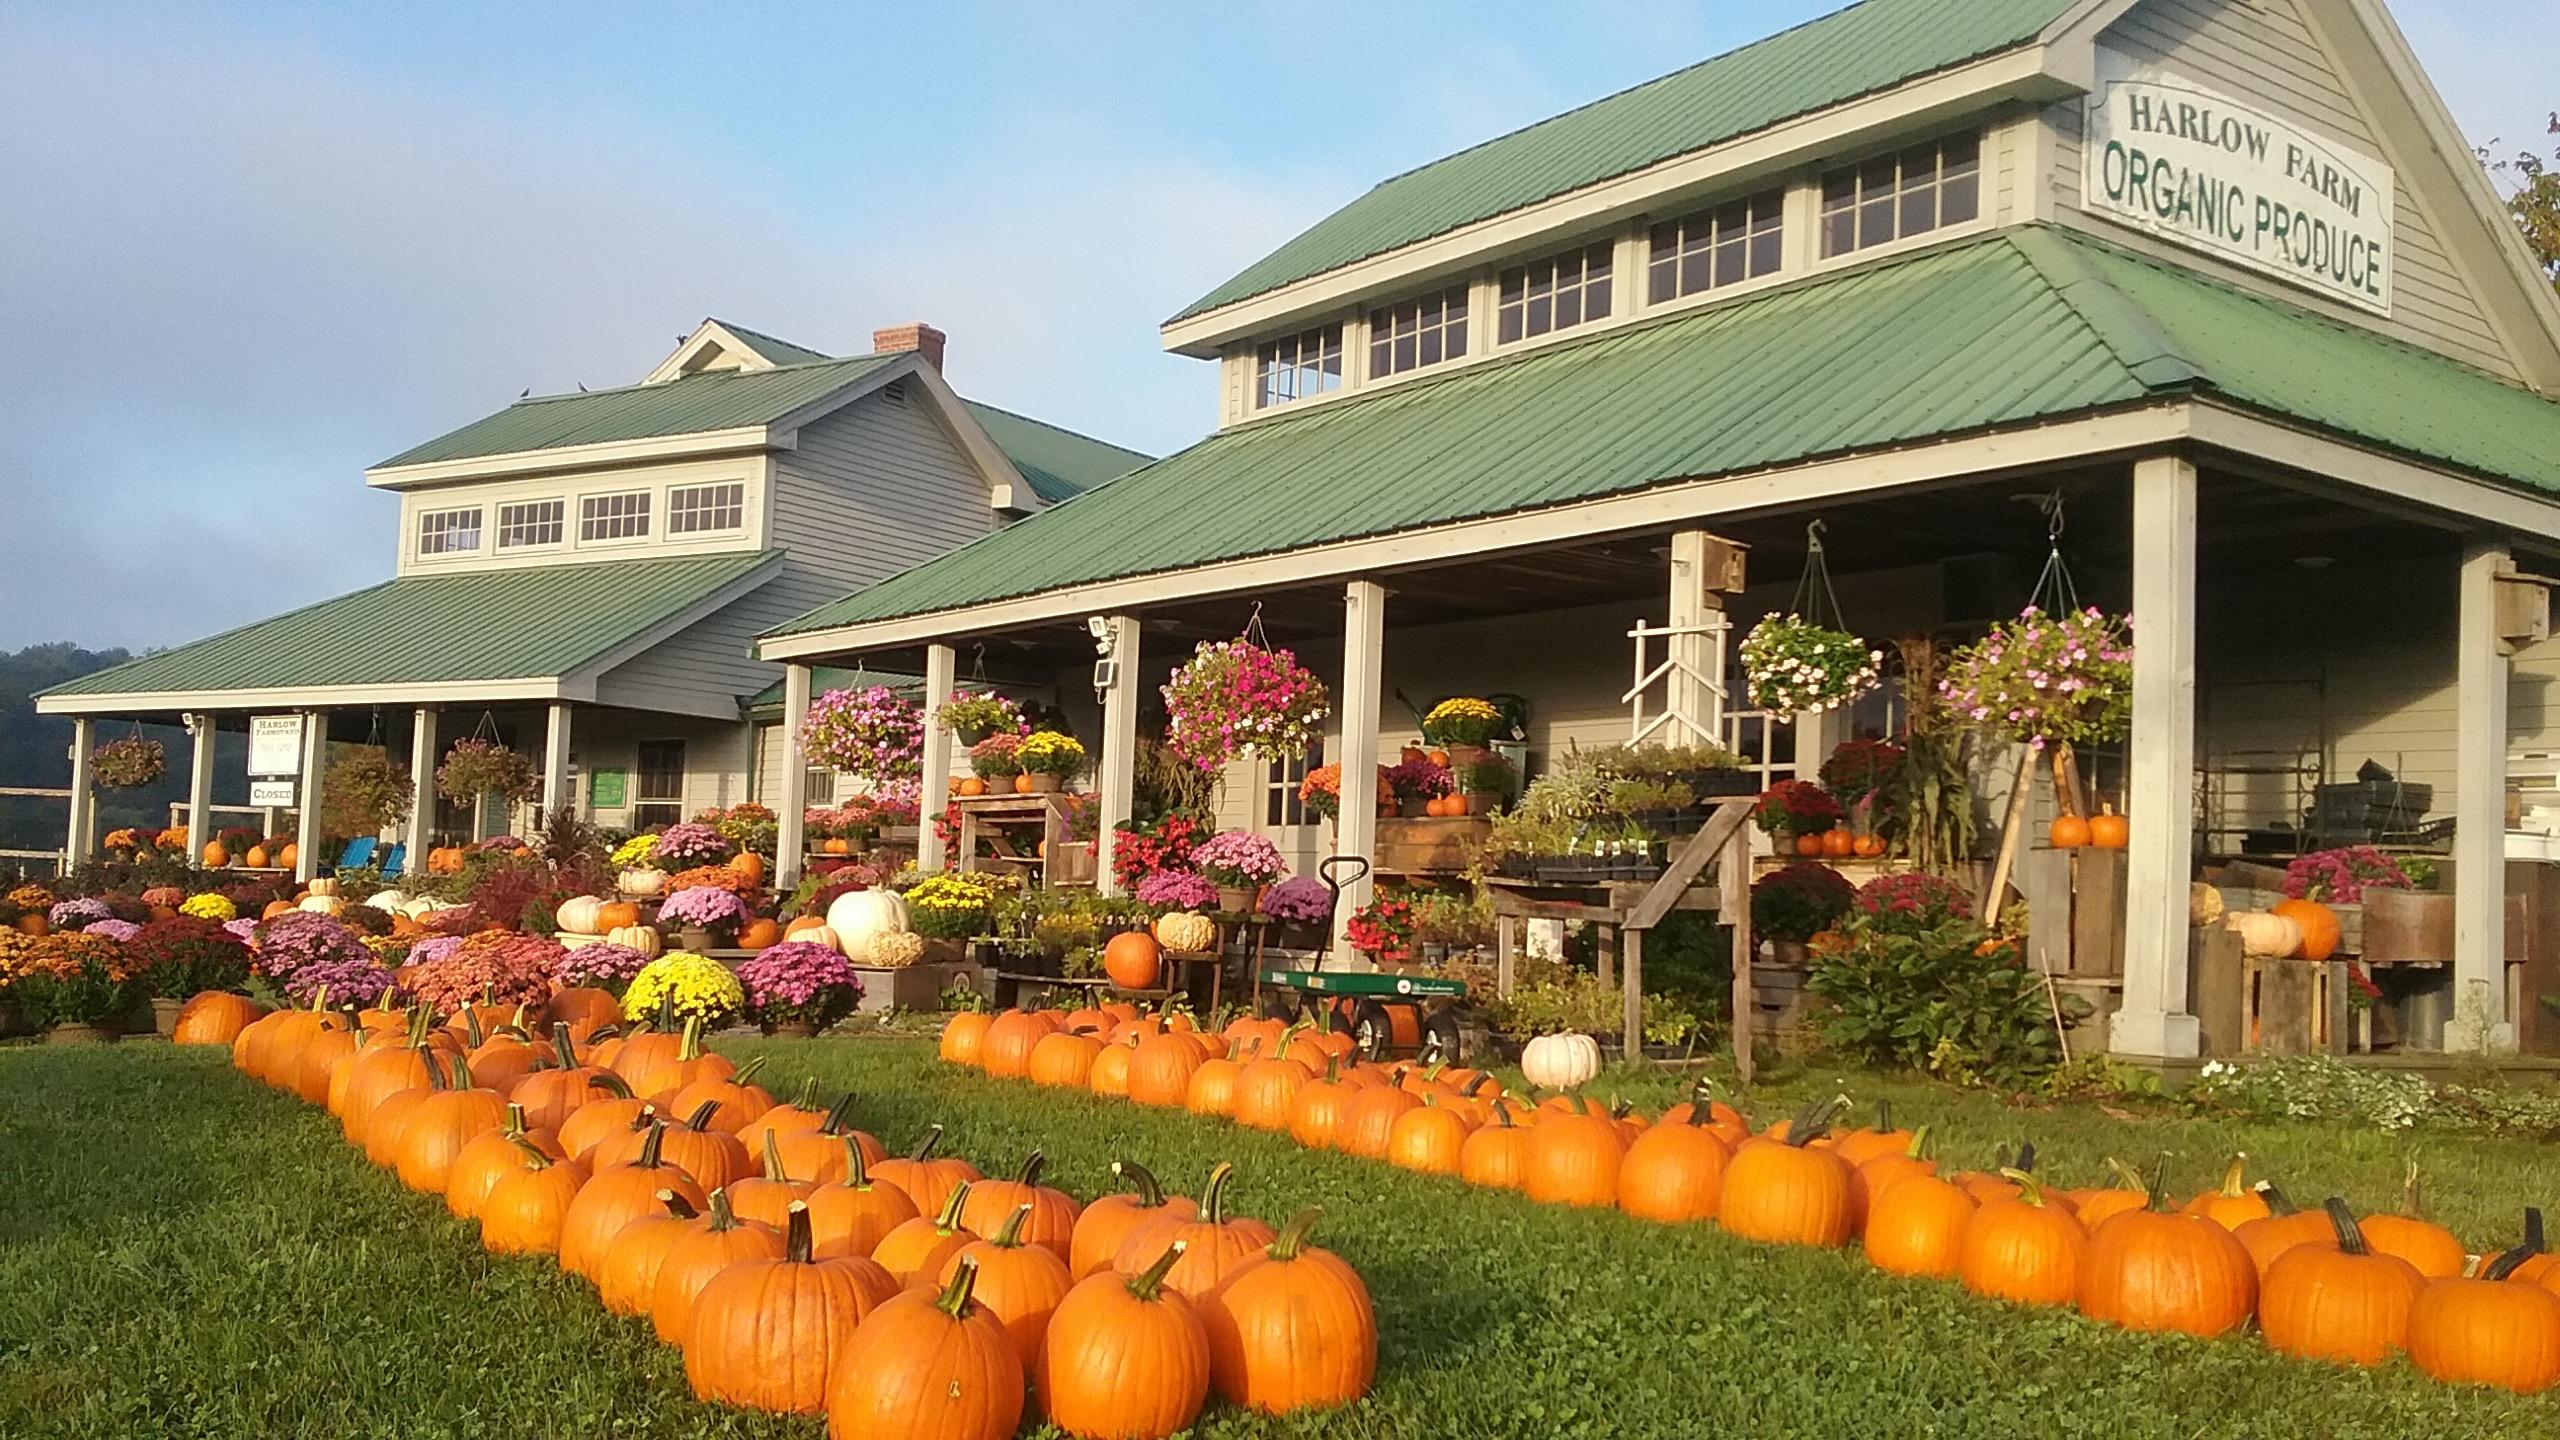 Vermont Fall Farm Wallpaper Harlow Farm An Organic Farm Nestled Along The Shores Of